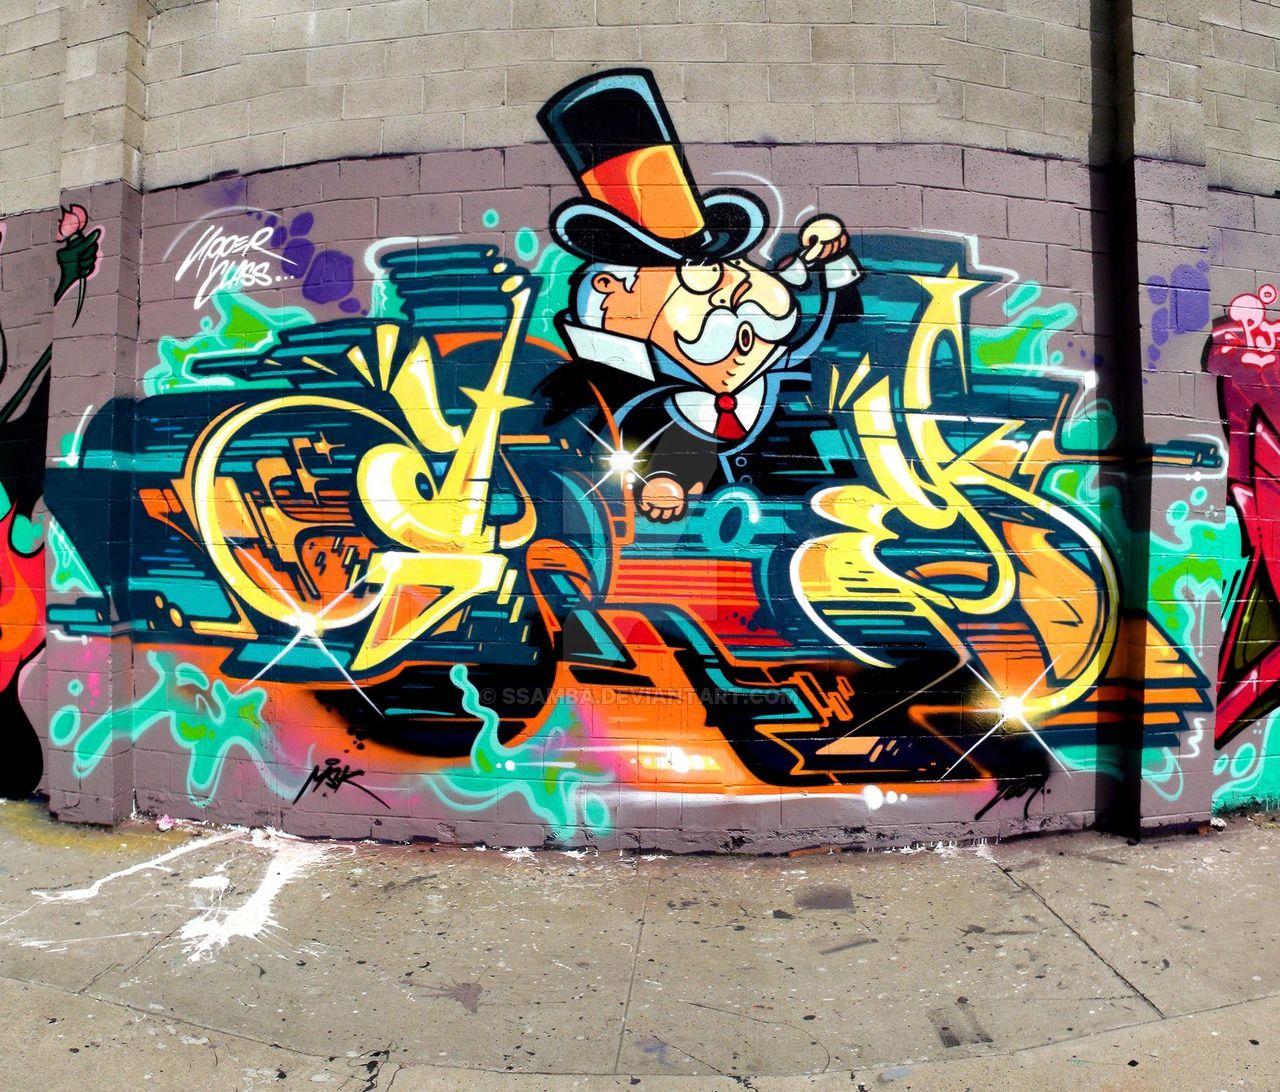 Картинки граффити для компании